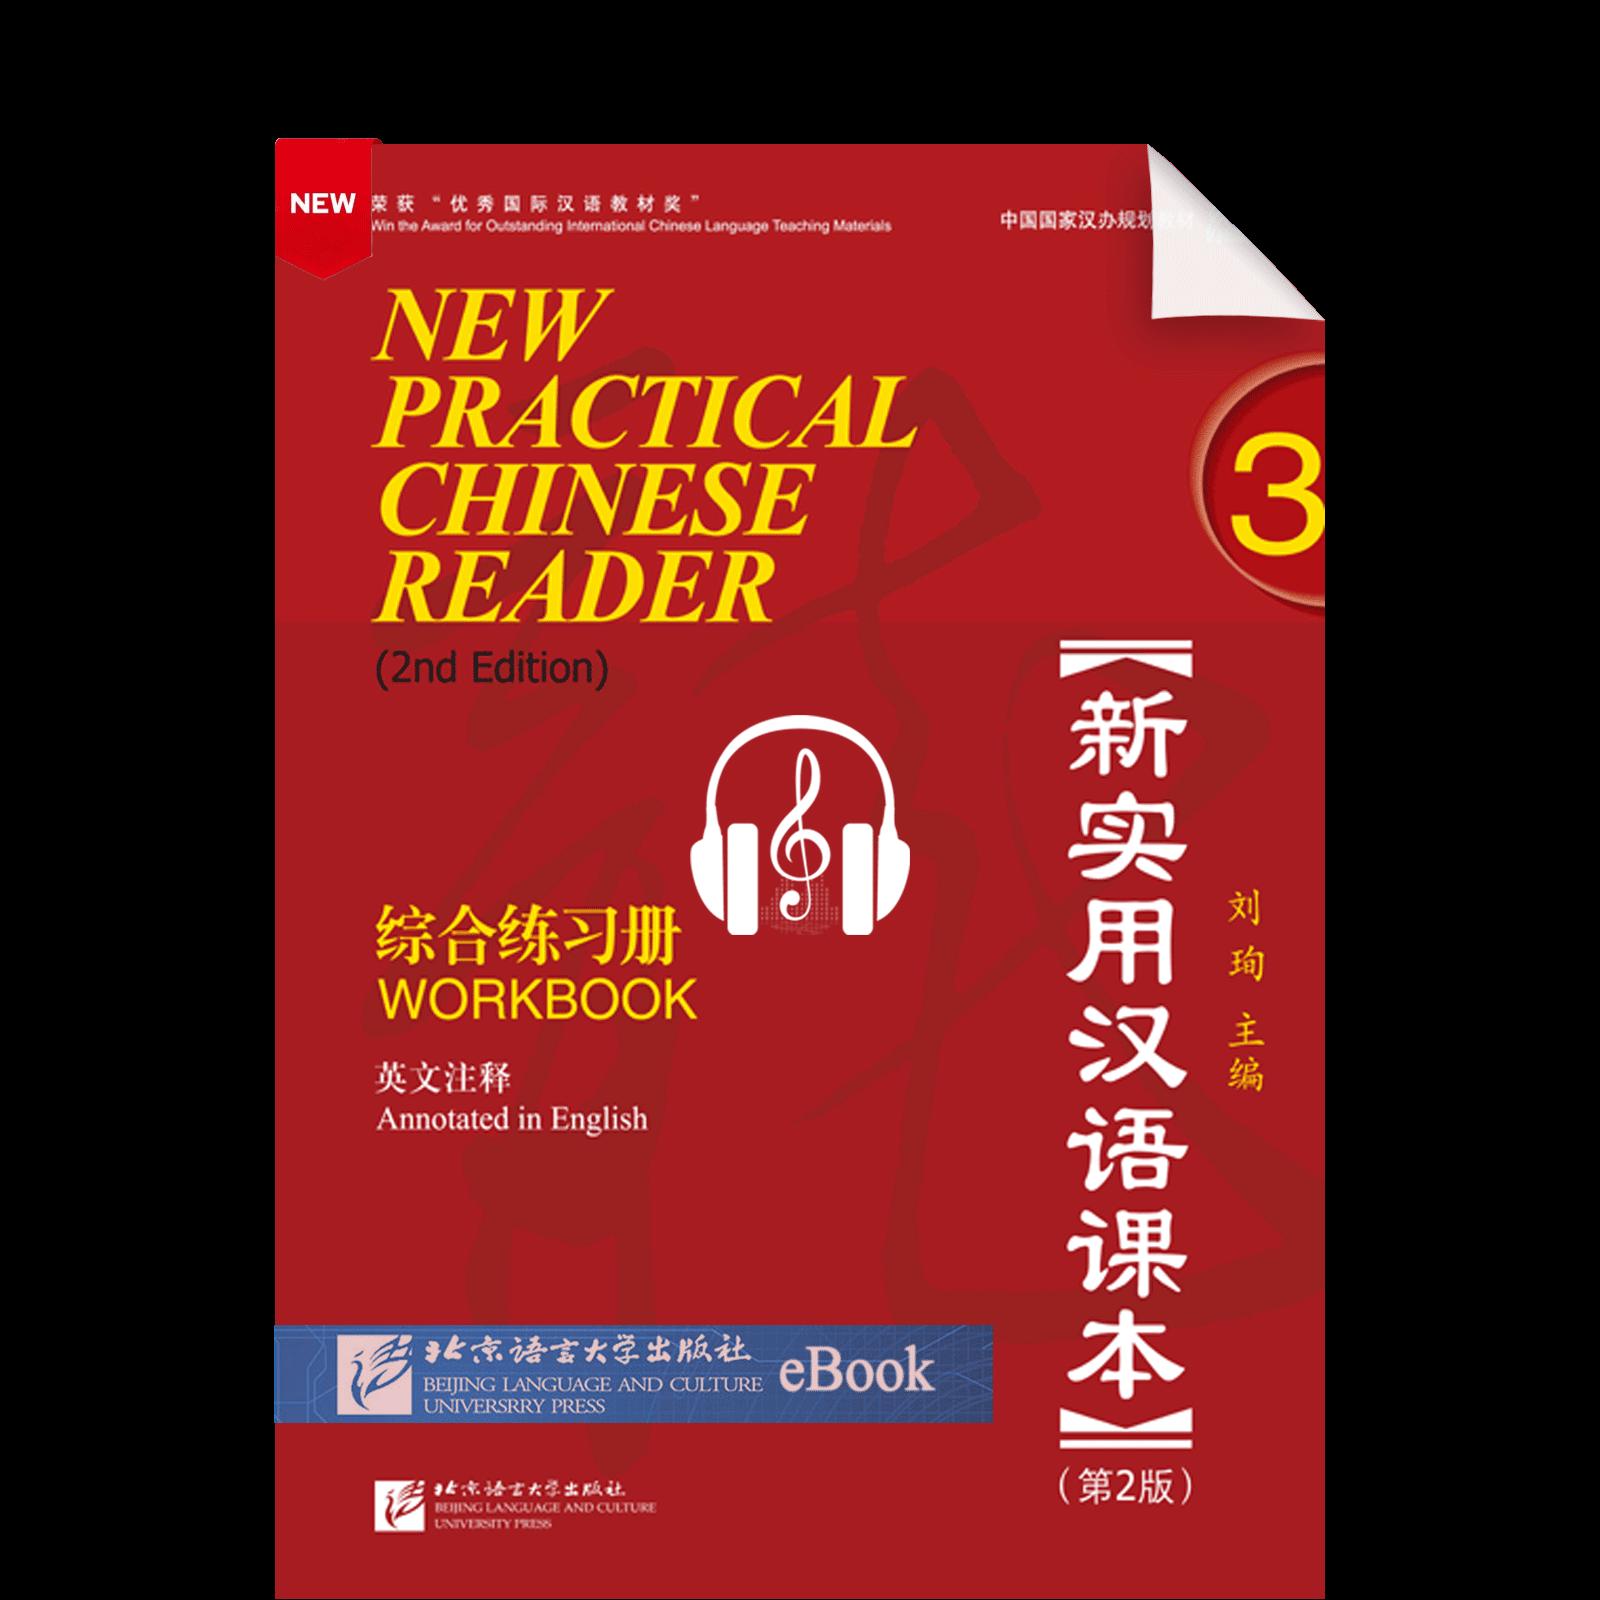 New Practical Chinese Reader Di2Ban Xin Shiyong Hanyu Keben Di3Ce Workbook with Audio